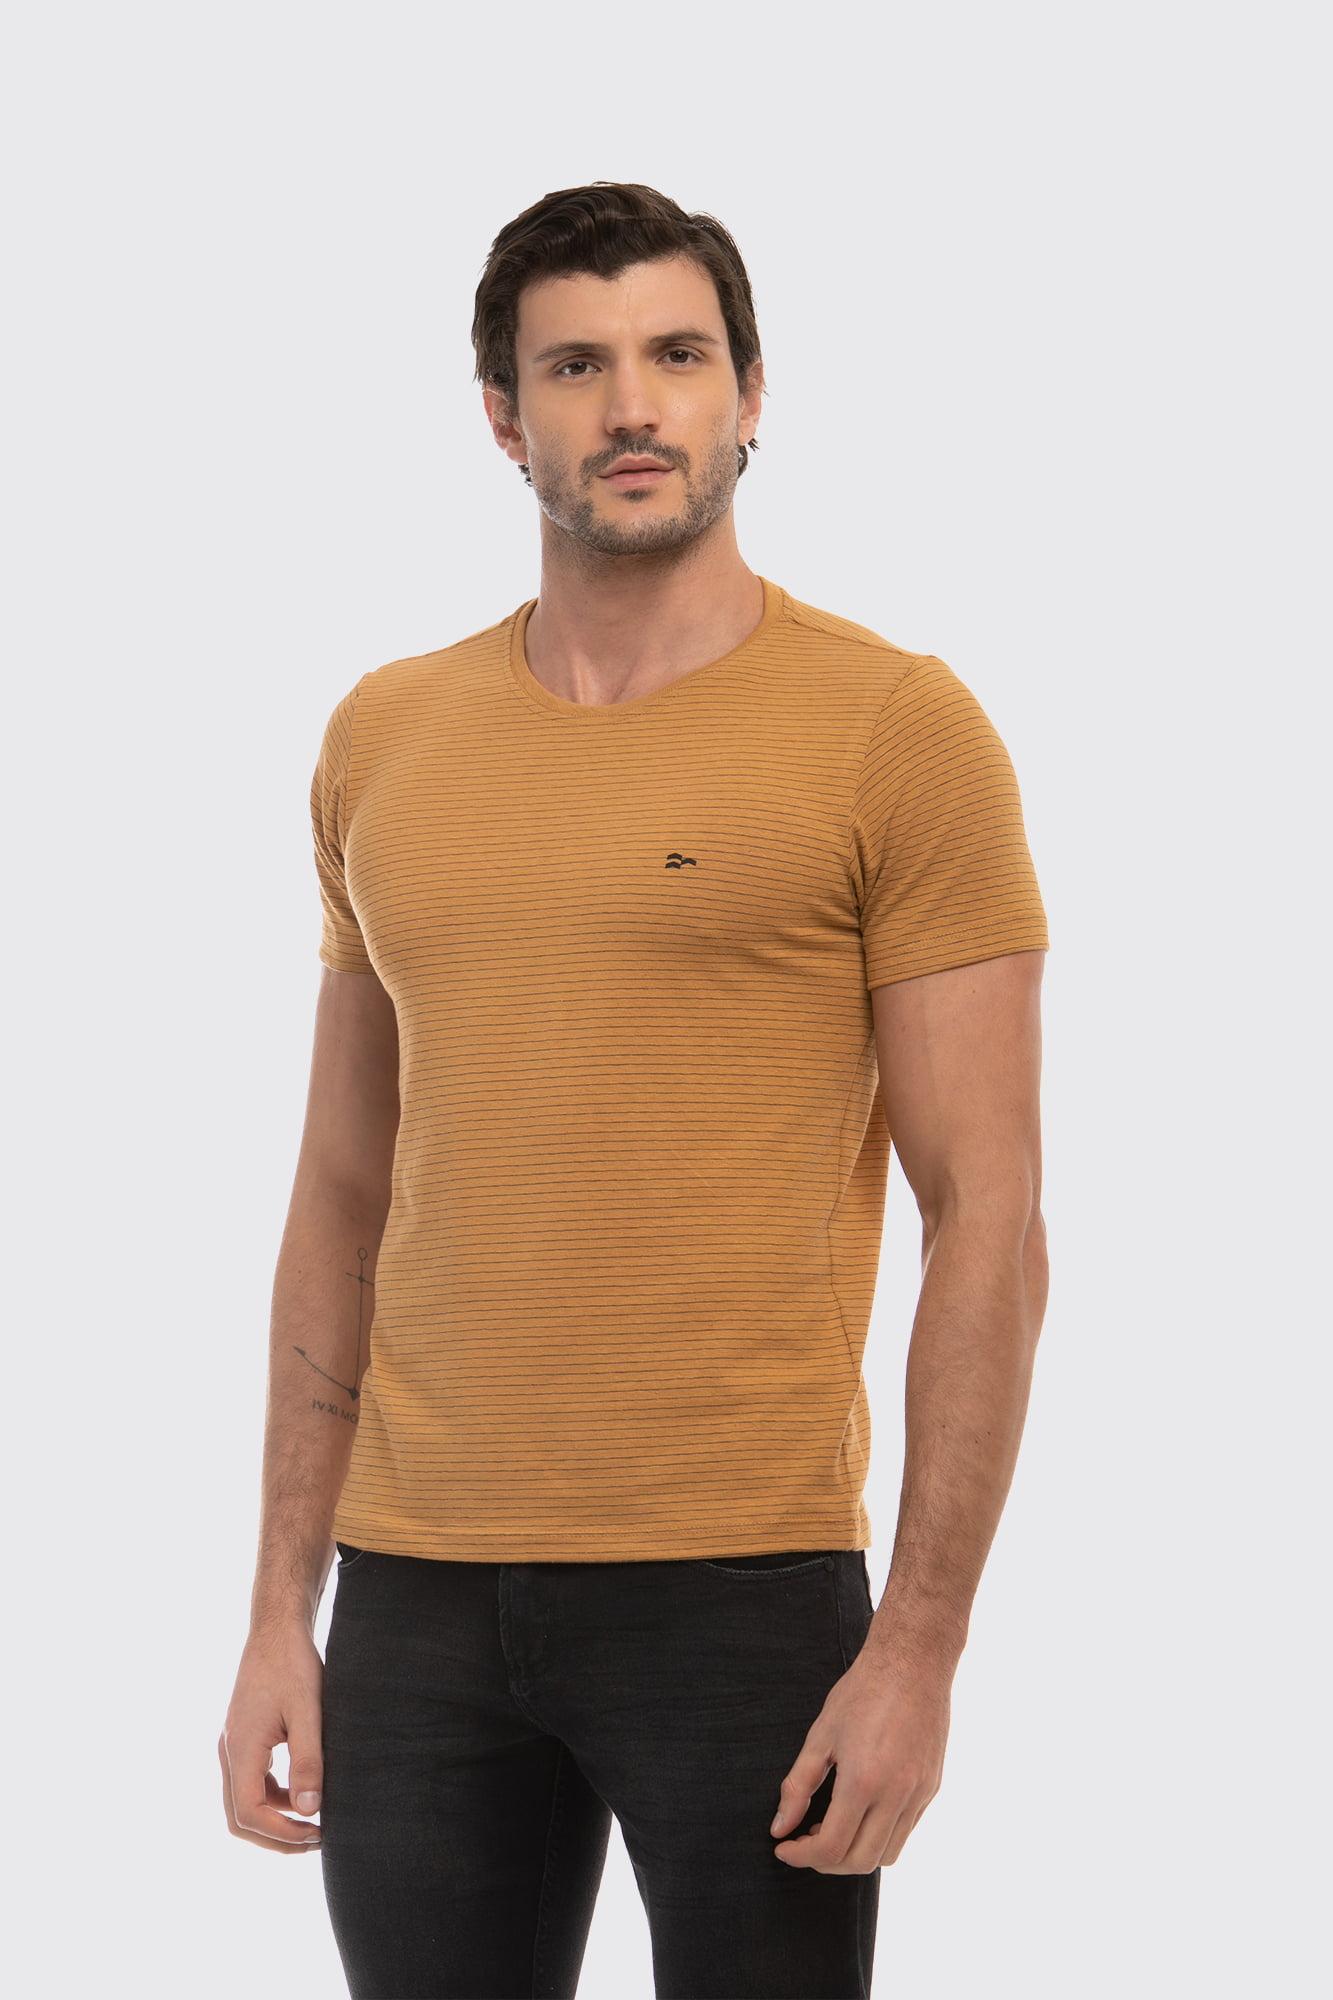 Camiseta Listrada Craft Amarela